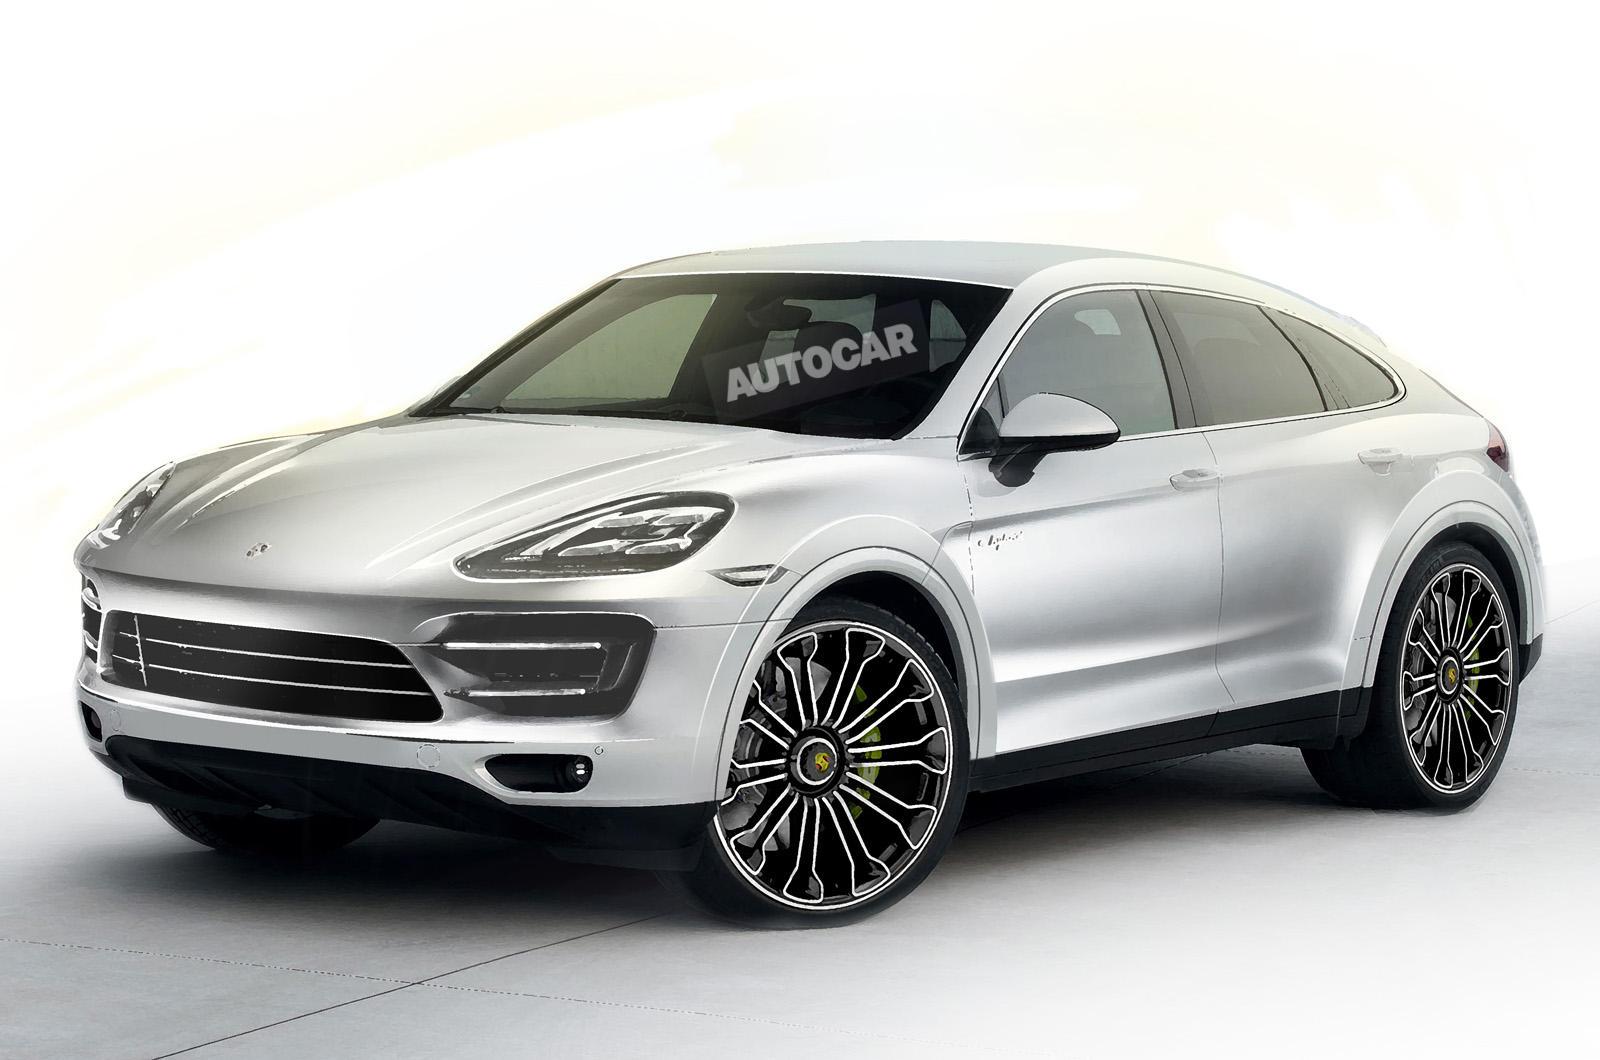 Volkswagen Group planuieste ofensiva pe piata SUV-urilor - Volkswagen Group planuieste ofensiva pe piata SUV-urilor